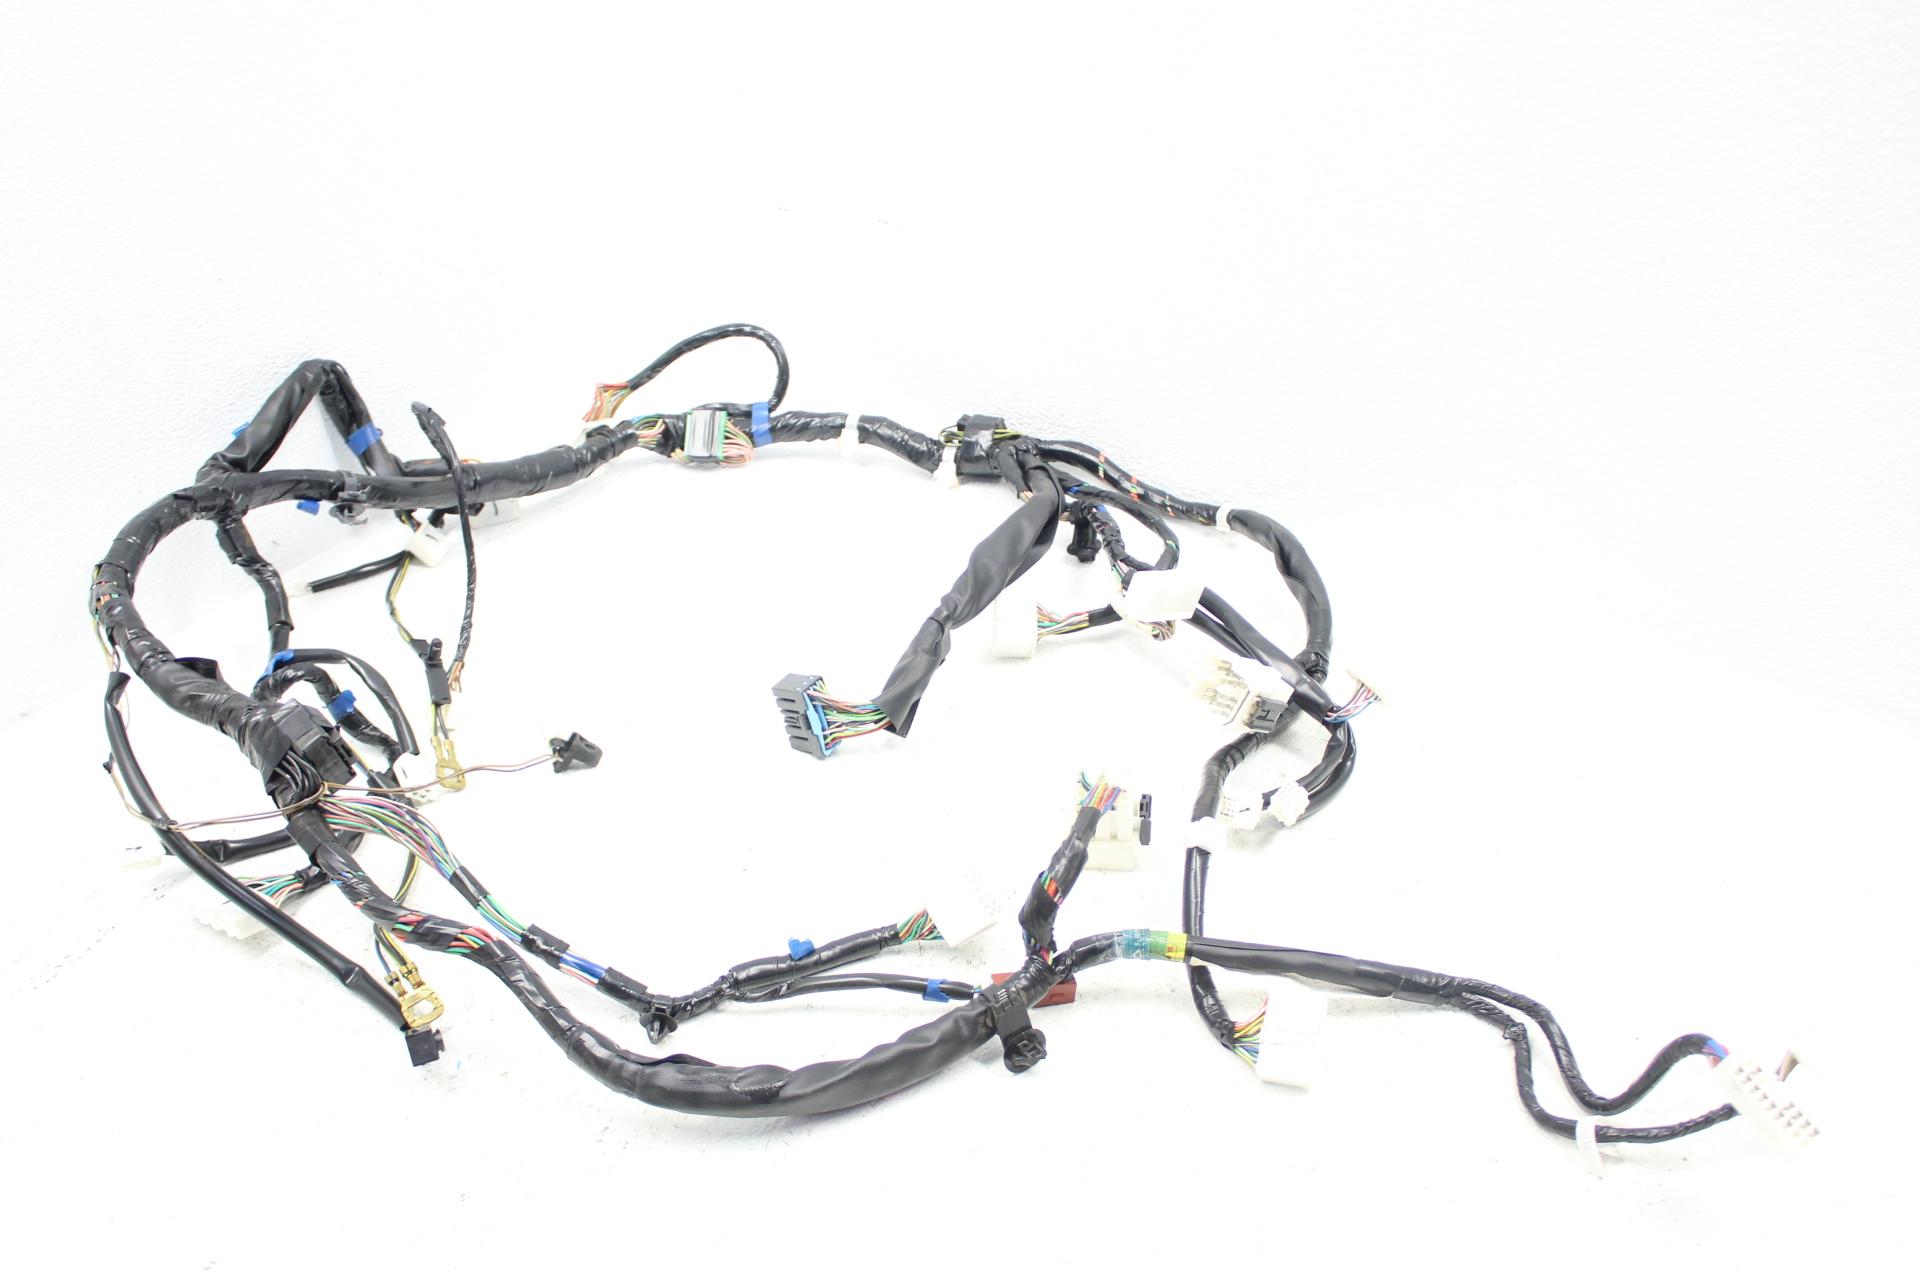 Subaru Wrx Sti Instrument Panel Dash Wiring